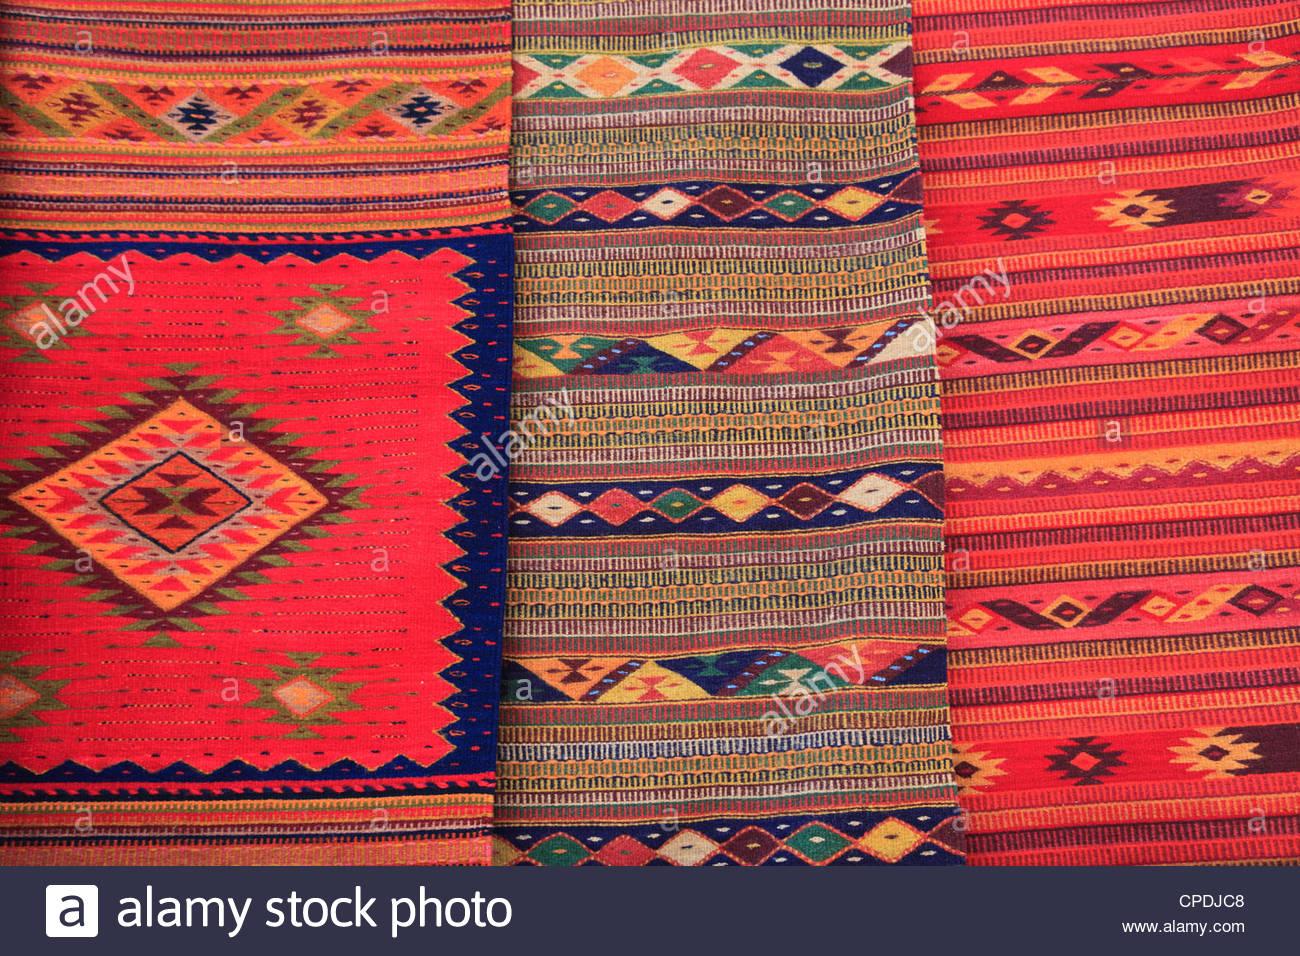 Woven rugs traditional hand woven rugs, oaxaca city, oaxaca, mexico, north america RAWIQOK